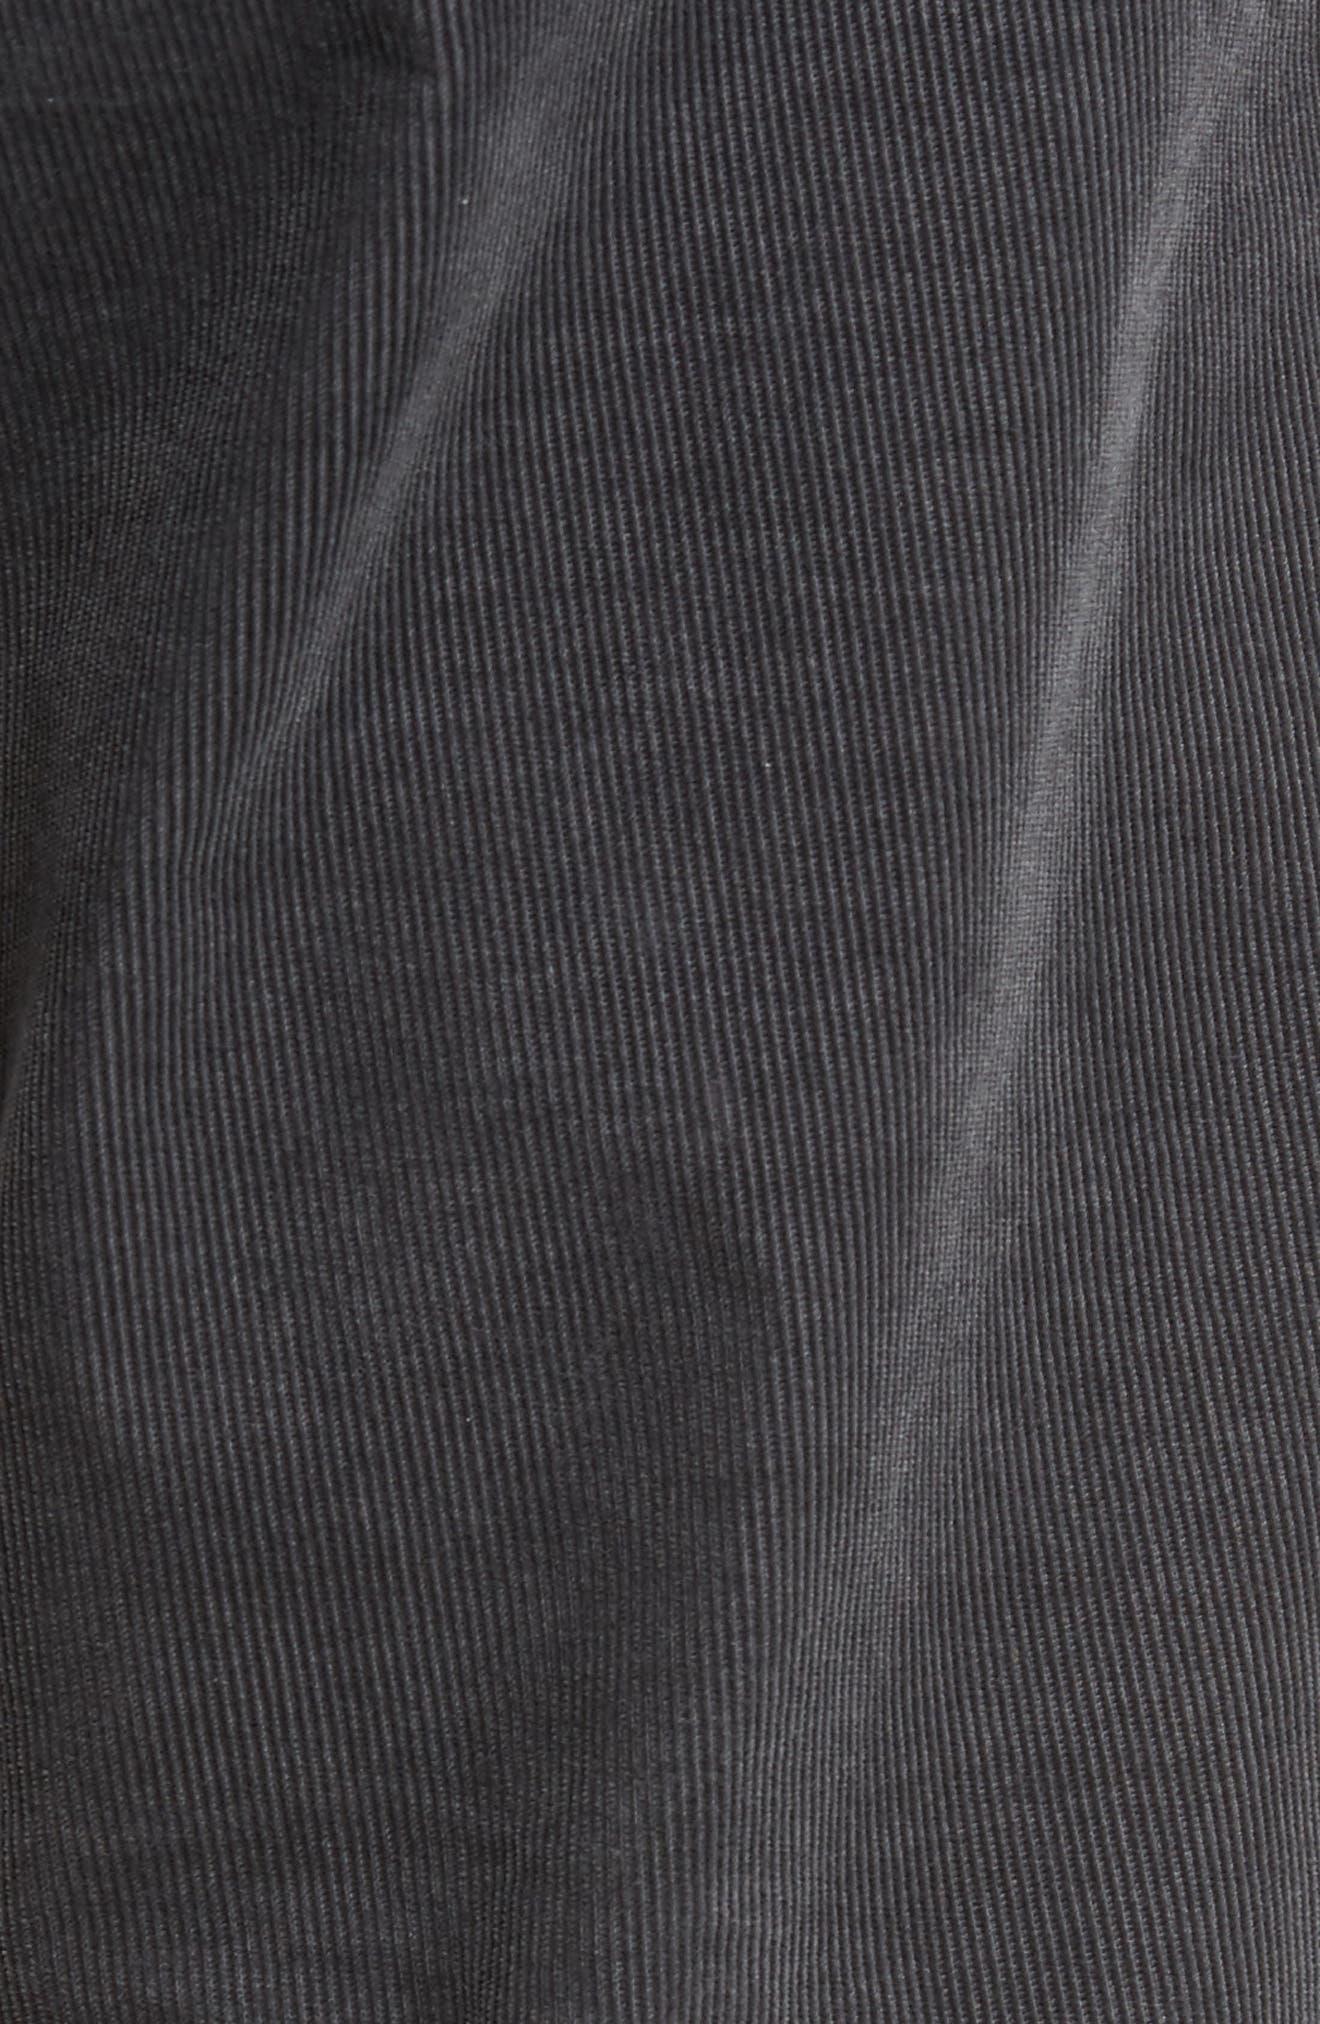 Five-Pocket Stretch Corduroy Pants,                             Alternate thumbnail 5, color,                             Granite